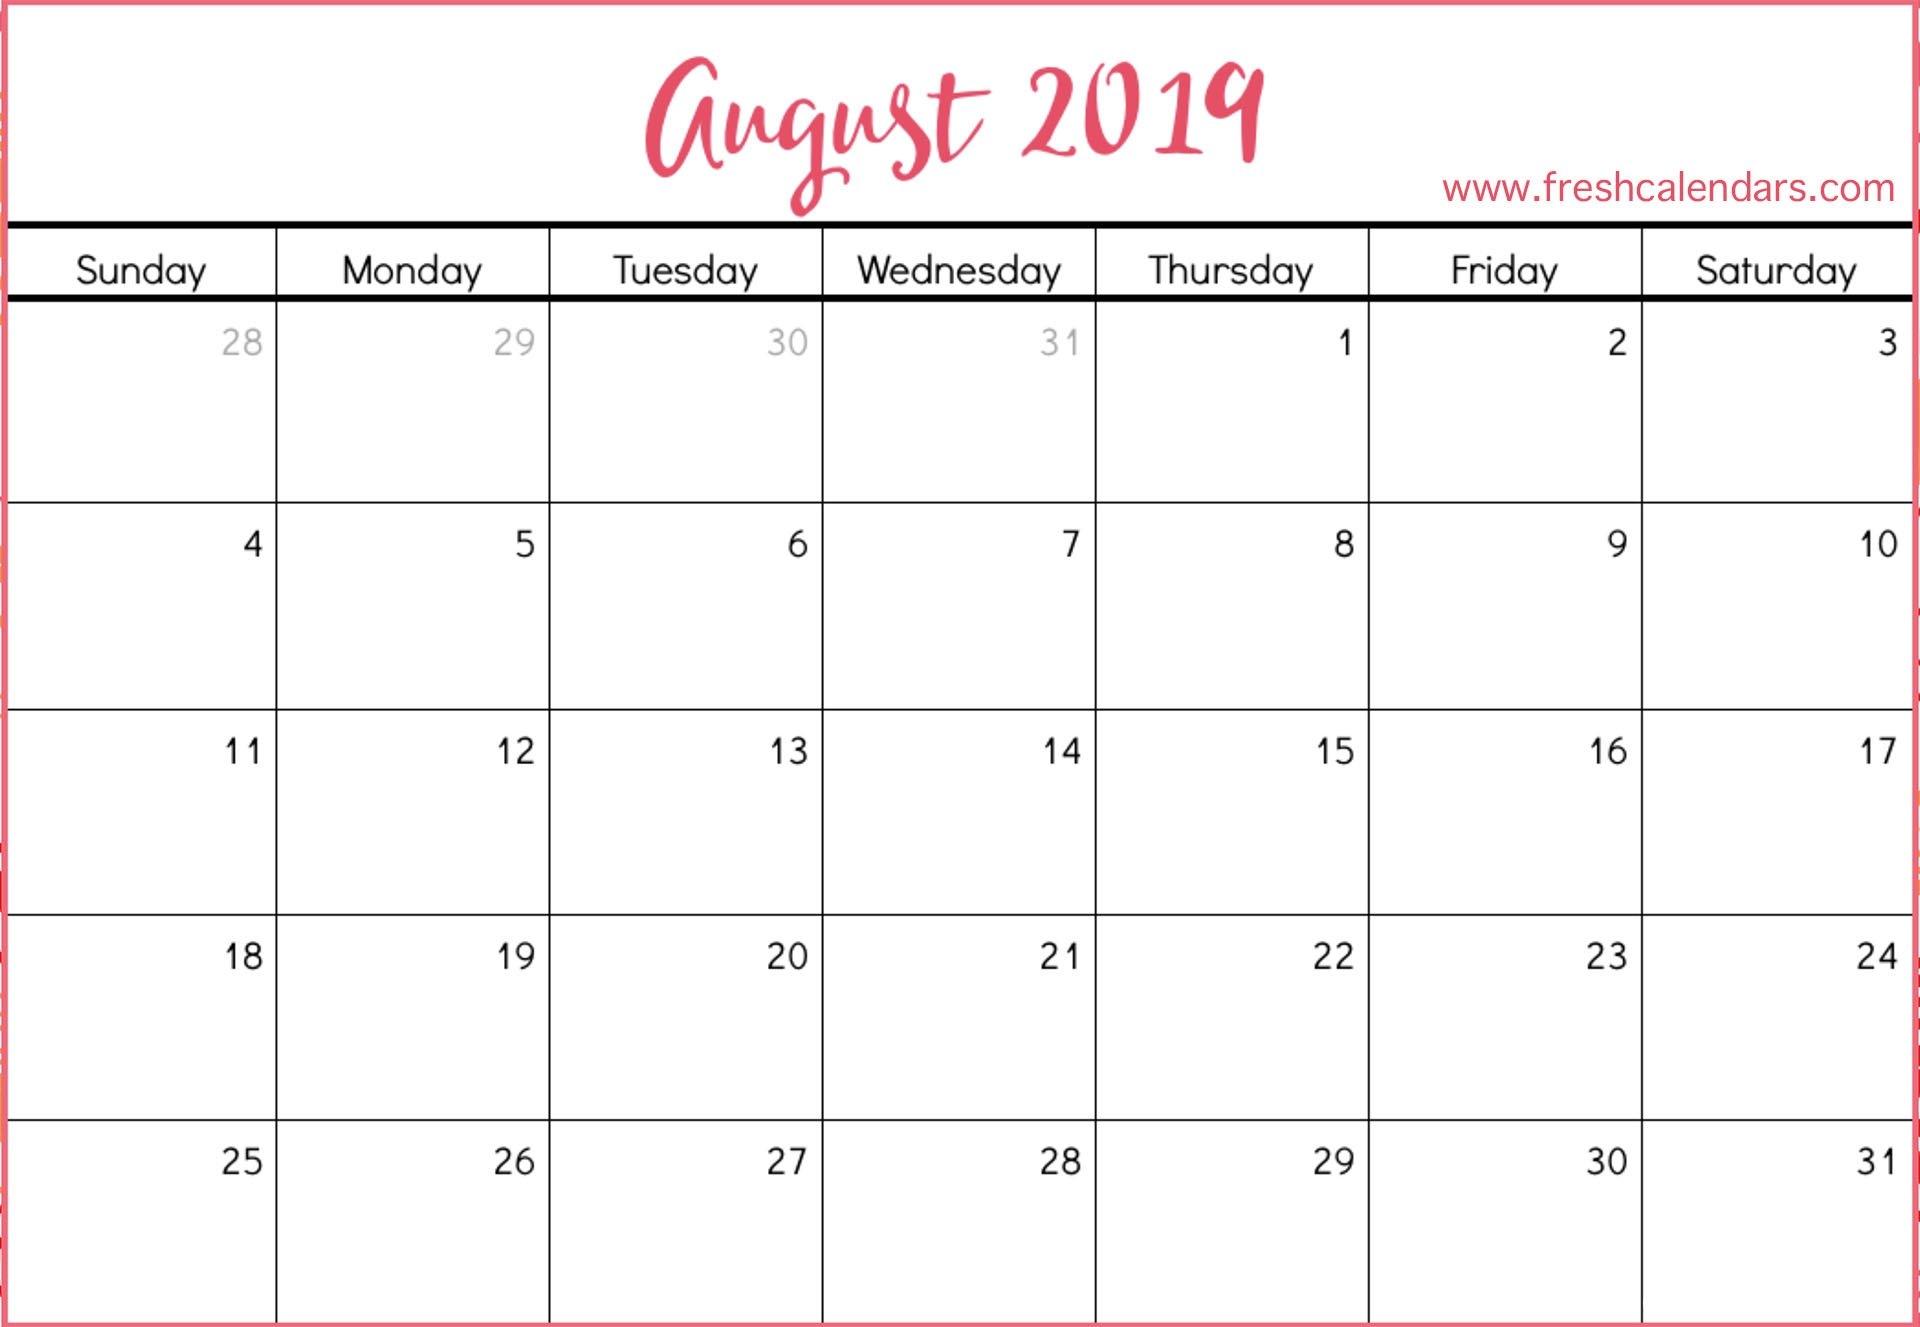 August 2019 Printable Calendars – Fresh Calendars Calendar Of 2019 August